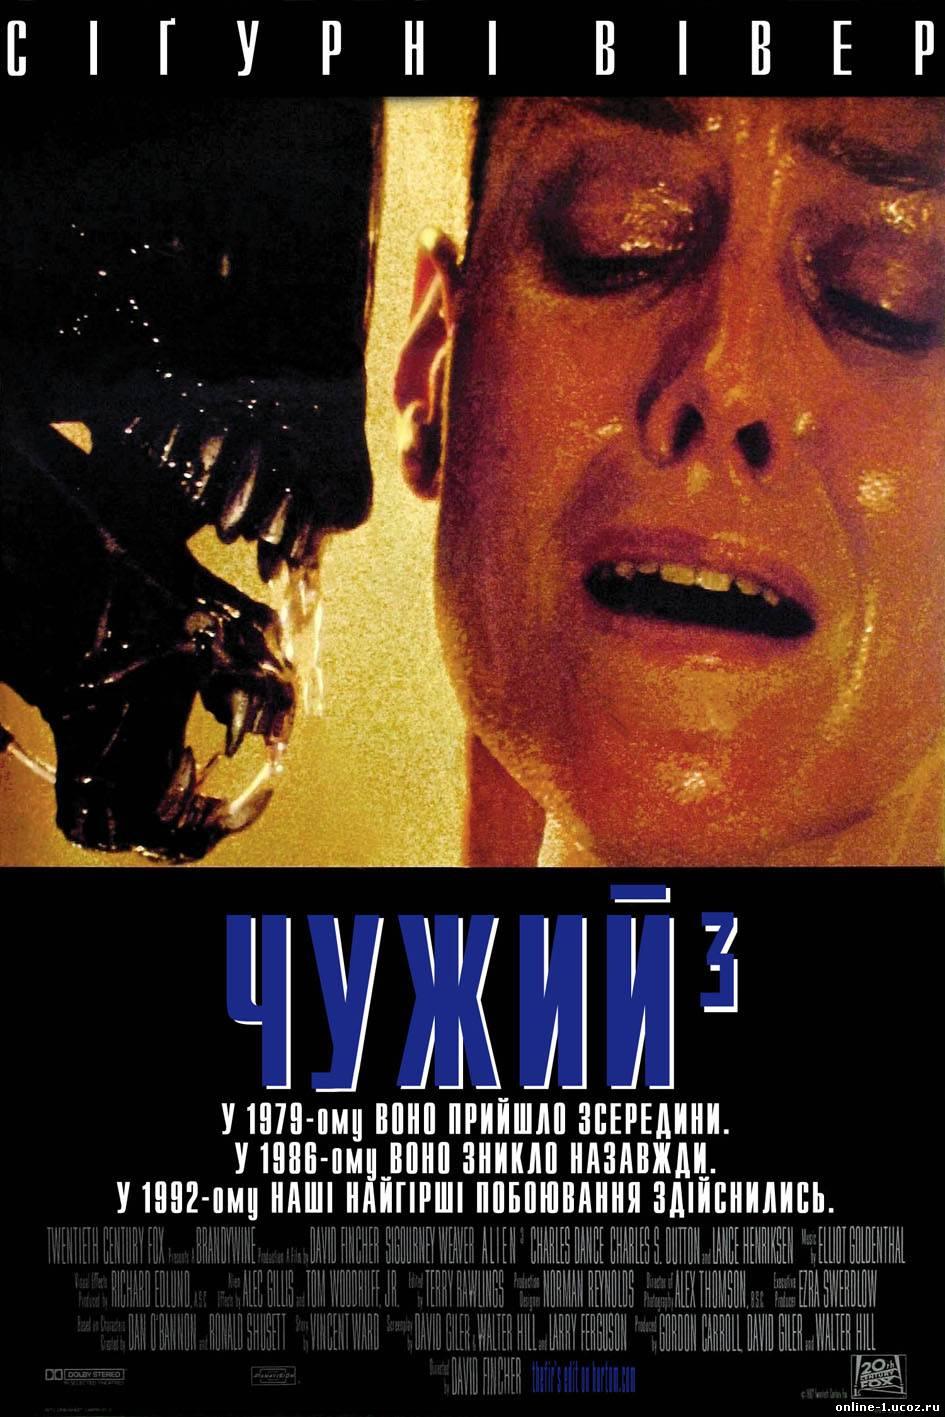 Чужой 3 alien 1992